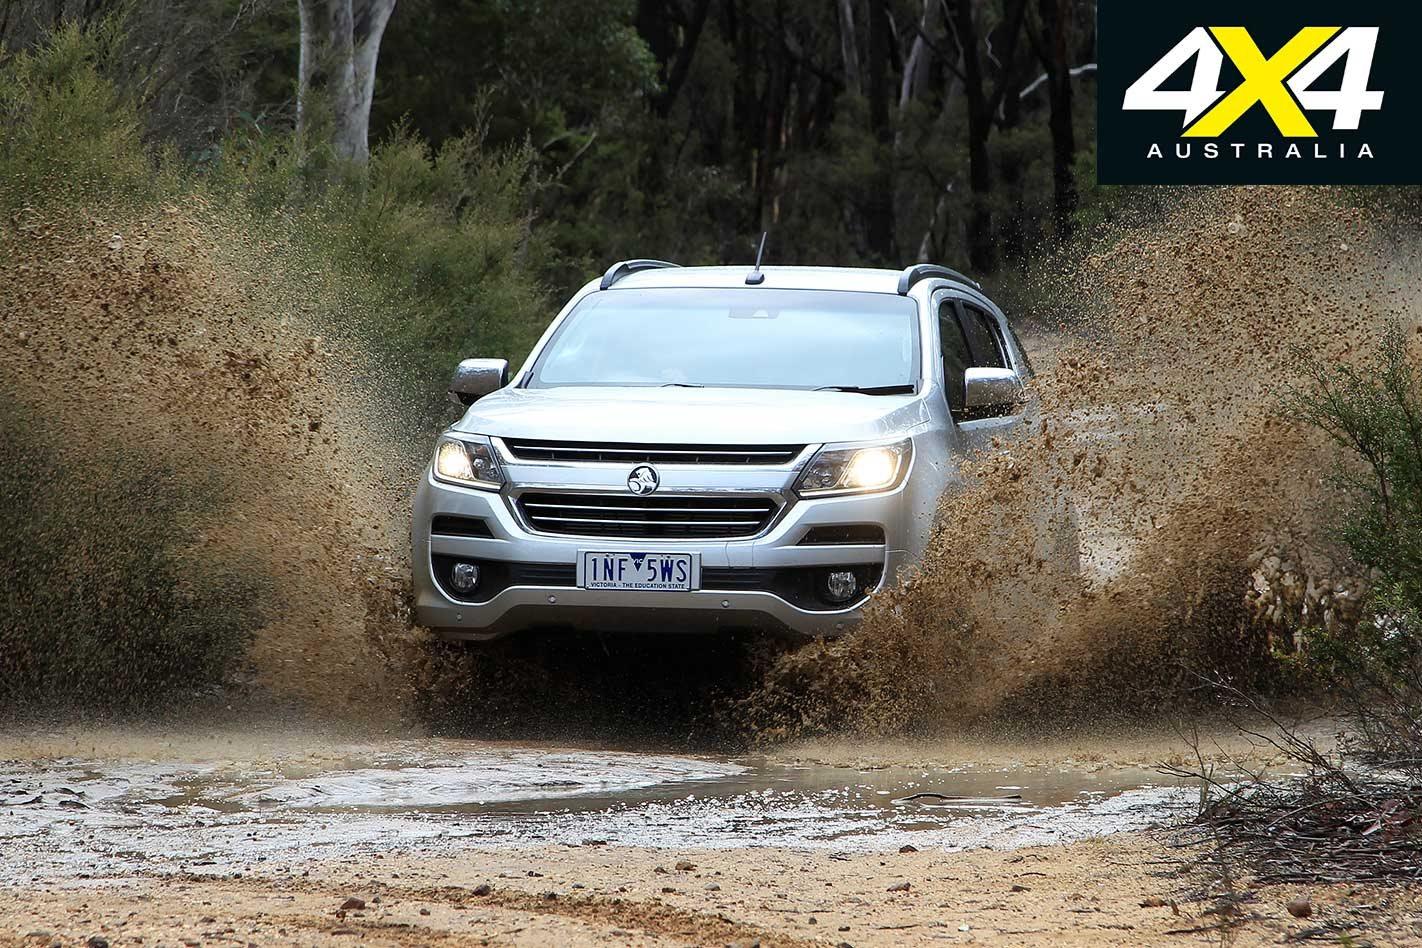 2019 Ford Everest vs Holden Trailblazer 4x4 comparison review